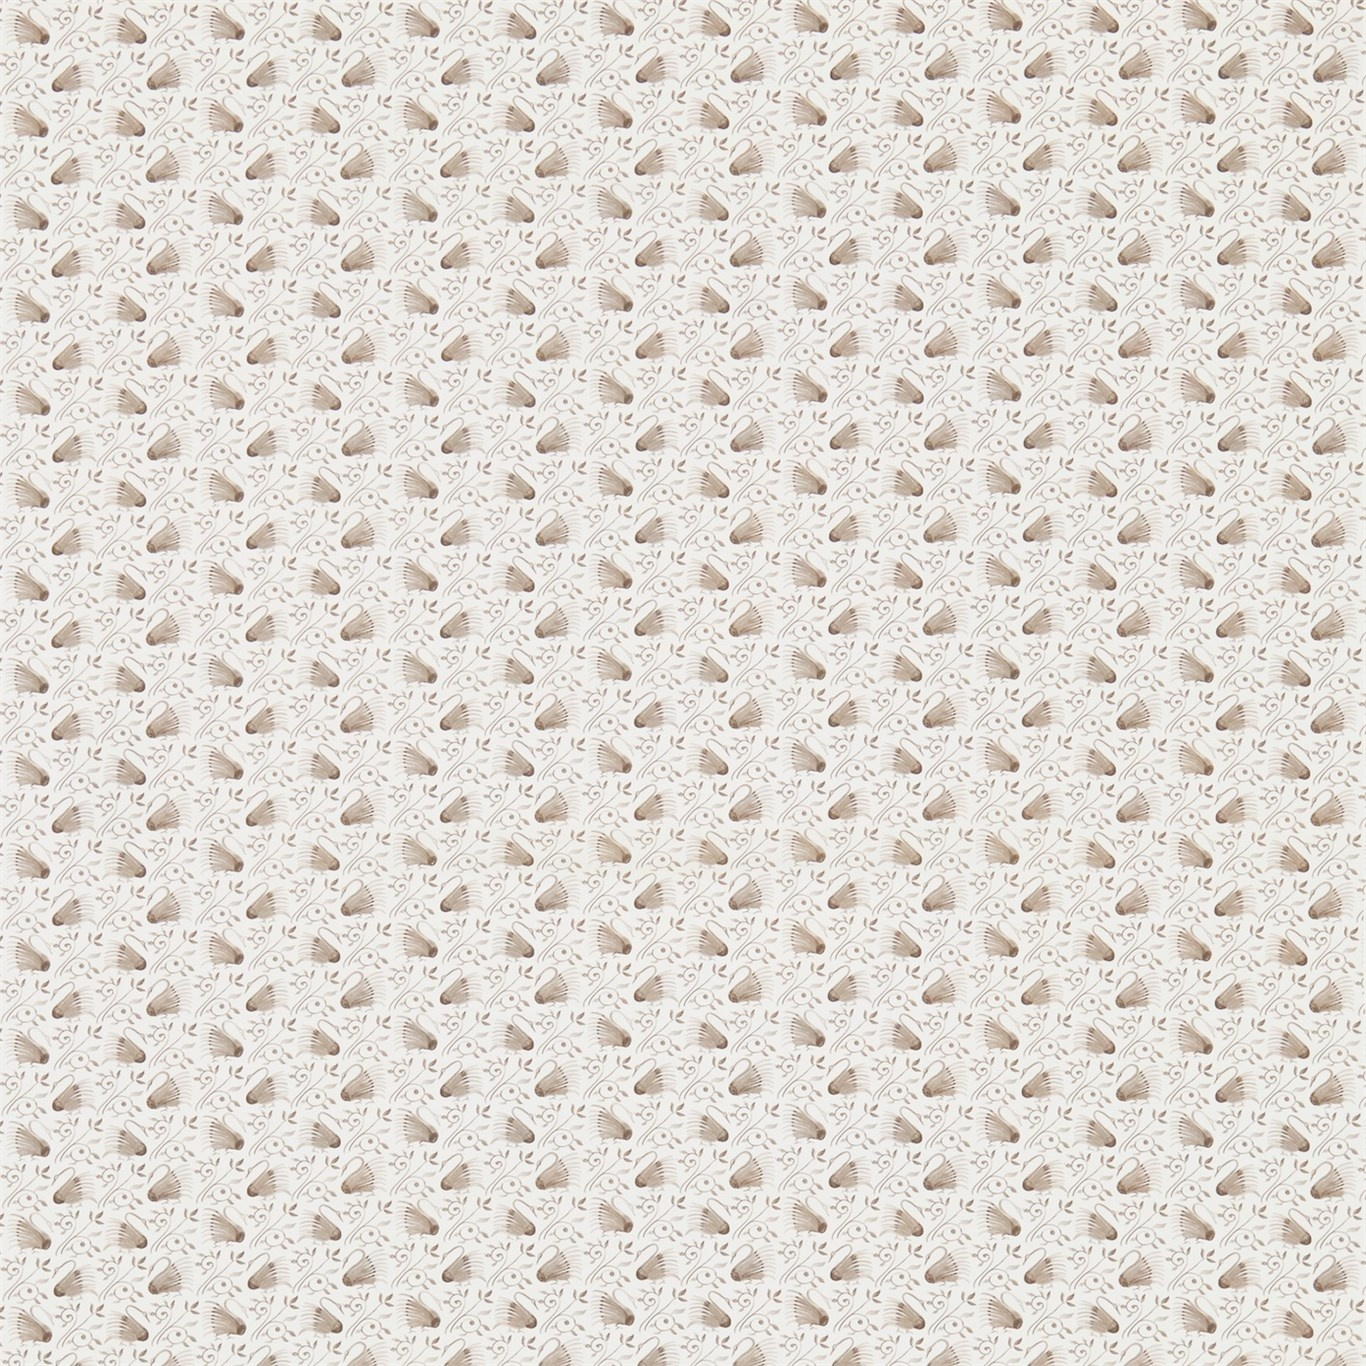 Image of Morris & Co Swans Linen/Ecru Curtain Fabric 224478